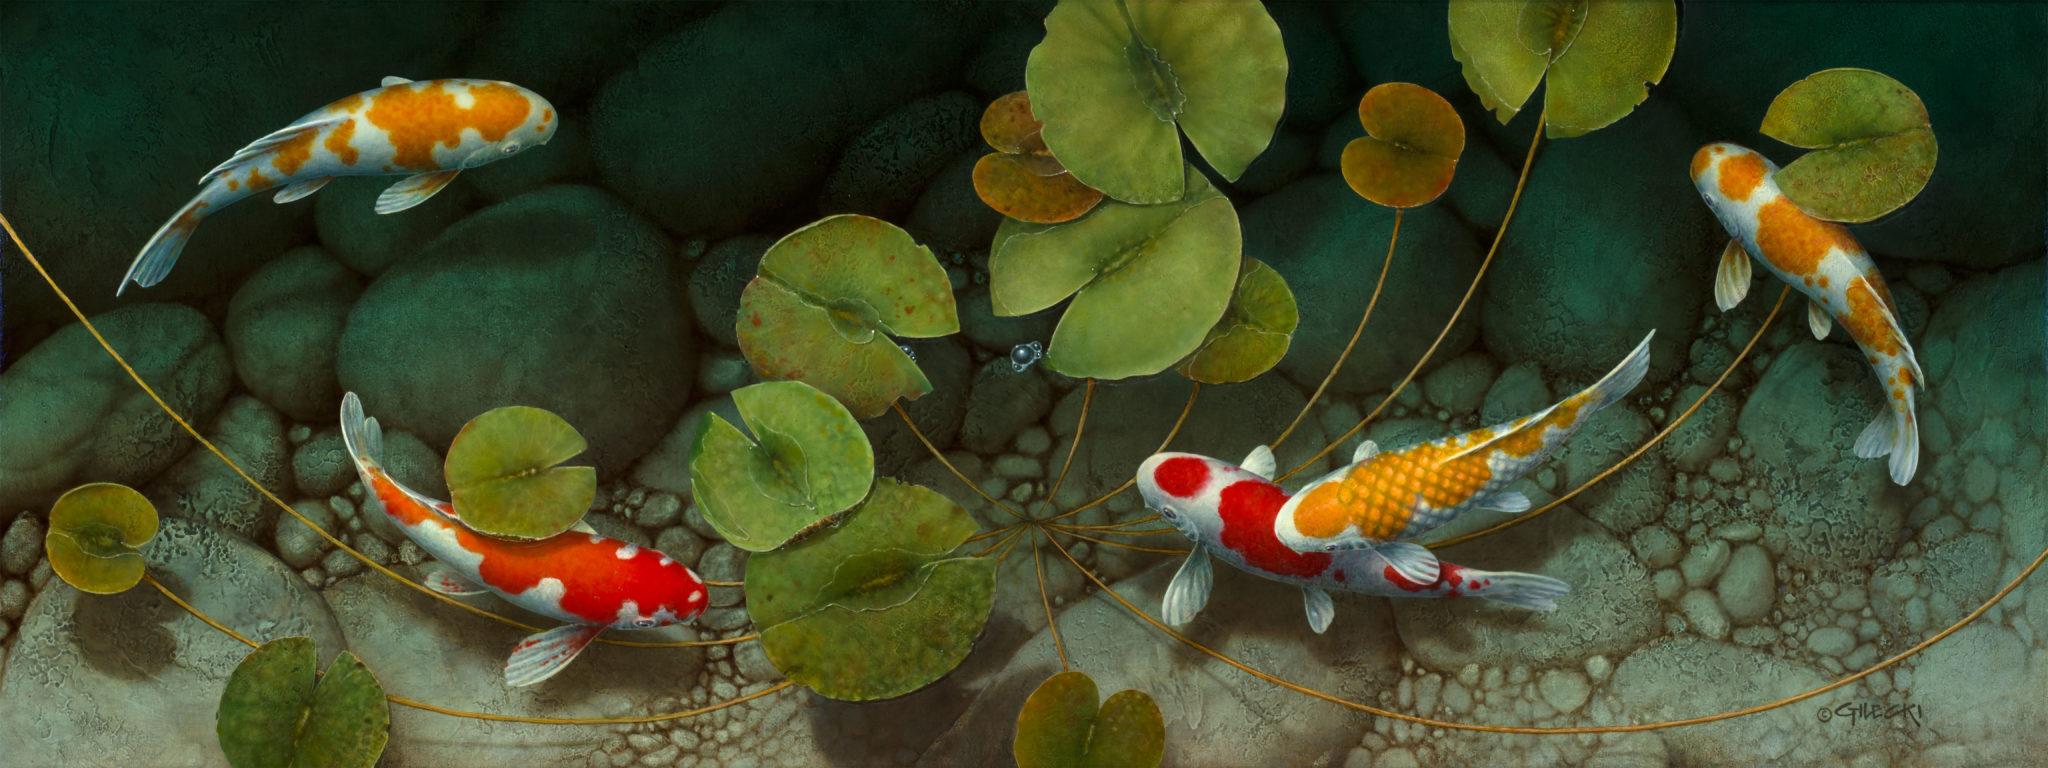 image of 5 koi fish